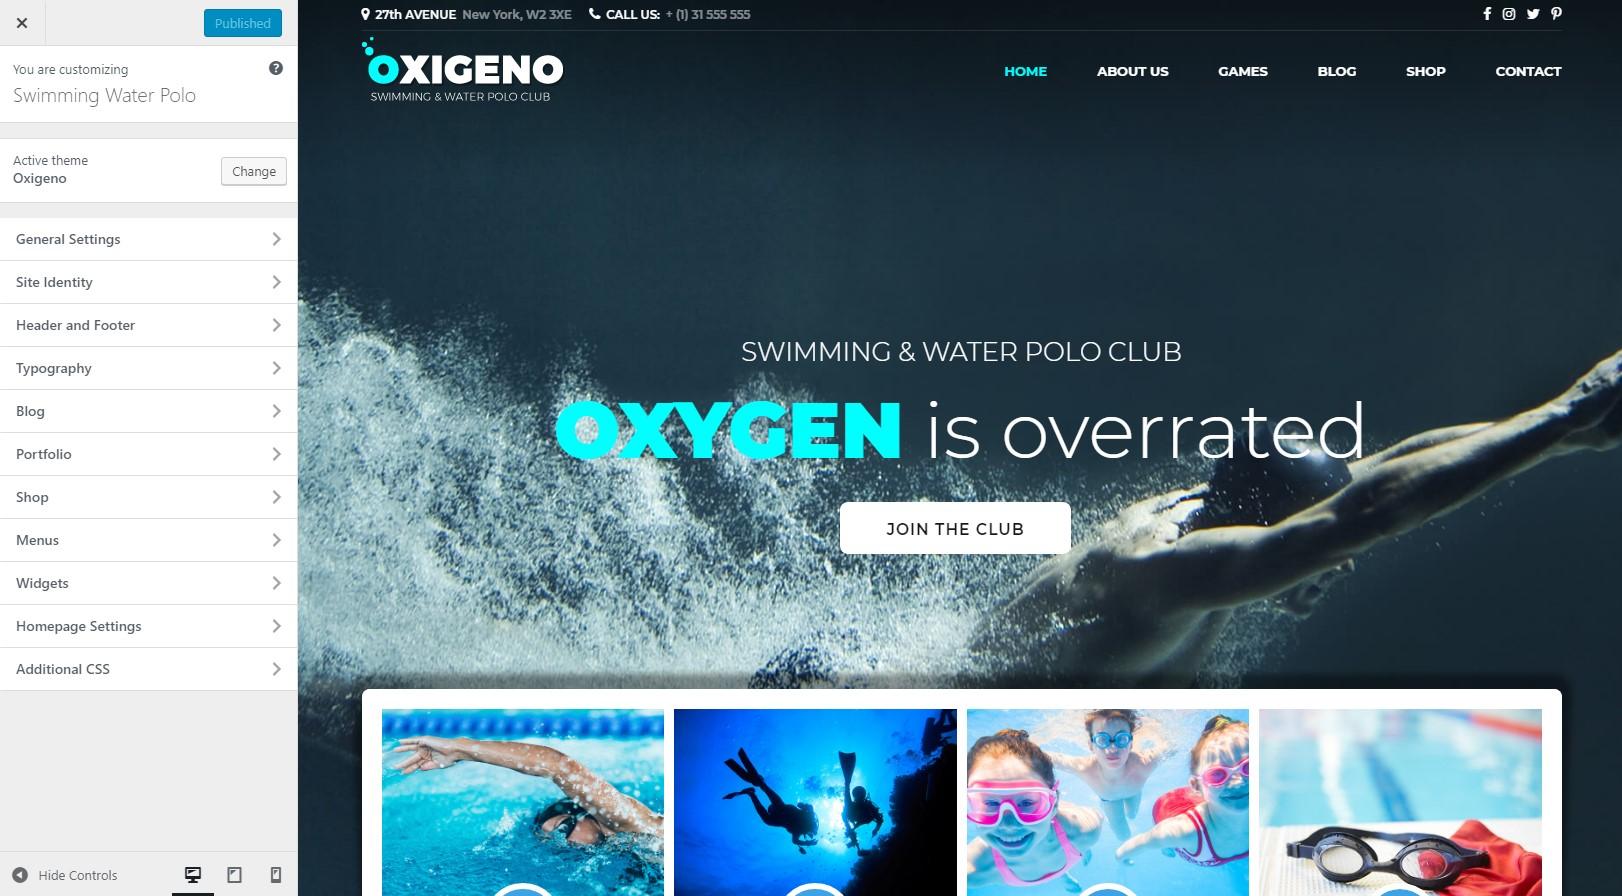 https://documentation.bold-themes.com/oxigeno/wp-content/uploads/sites/28/2018/01/customization.jpg